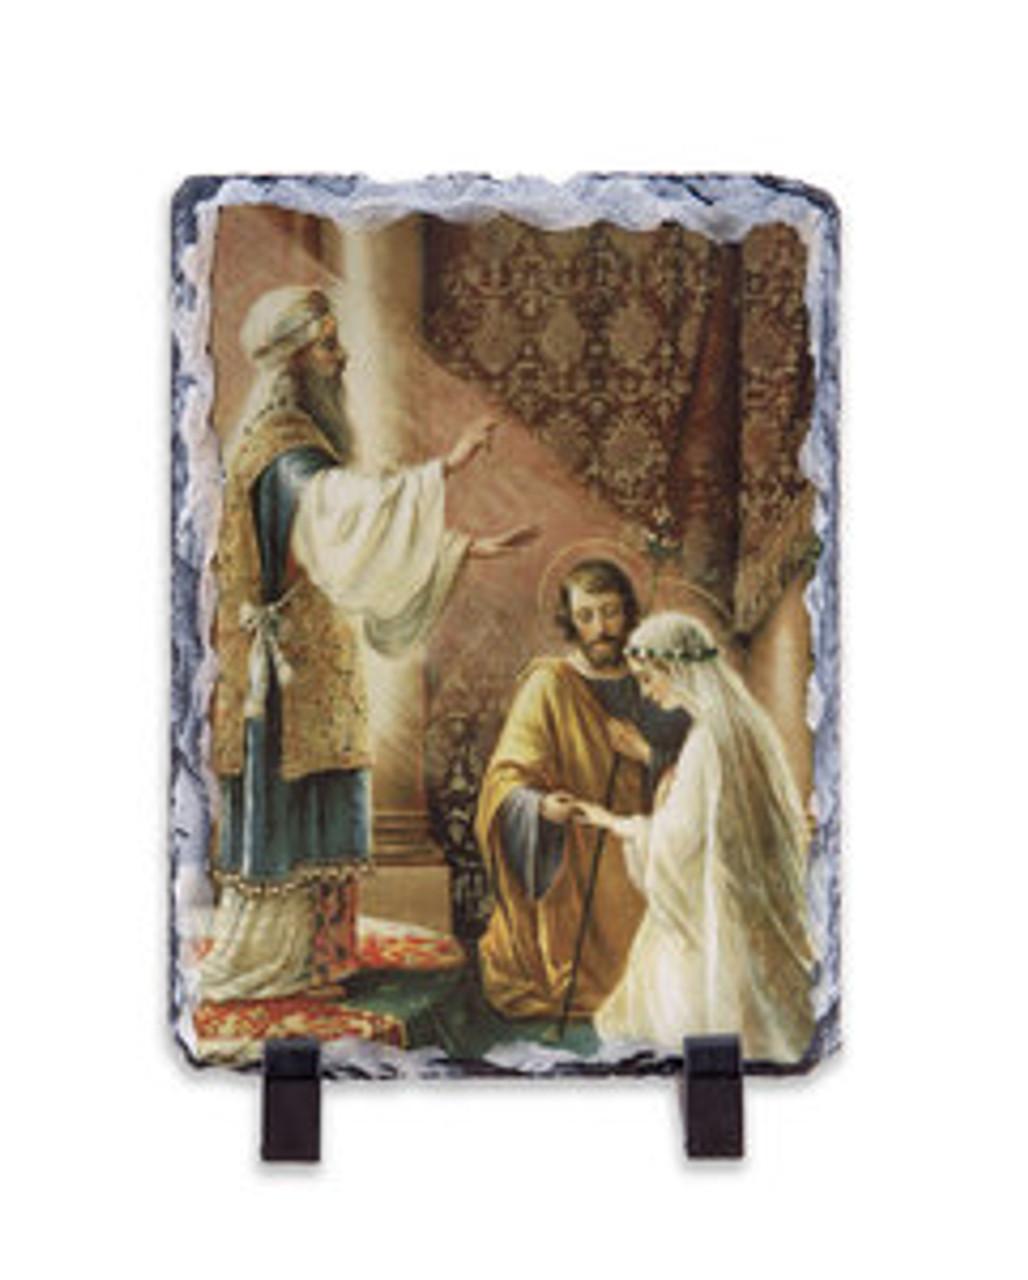 Wedding of Joseph and Mary Vertical Slate Tile